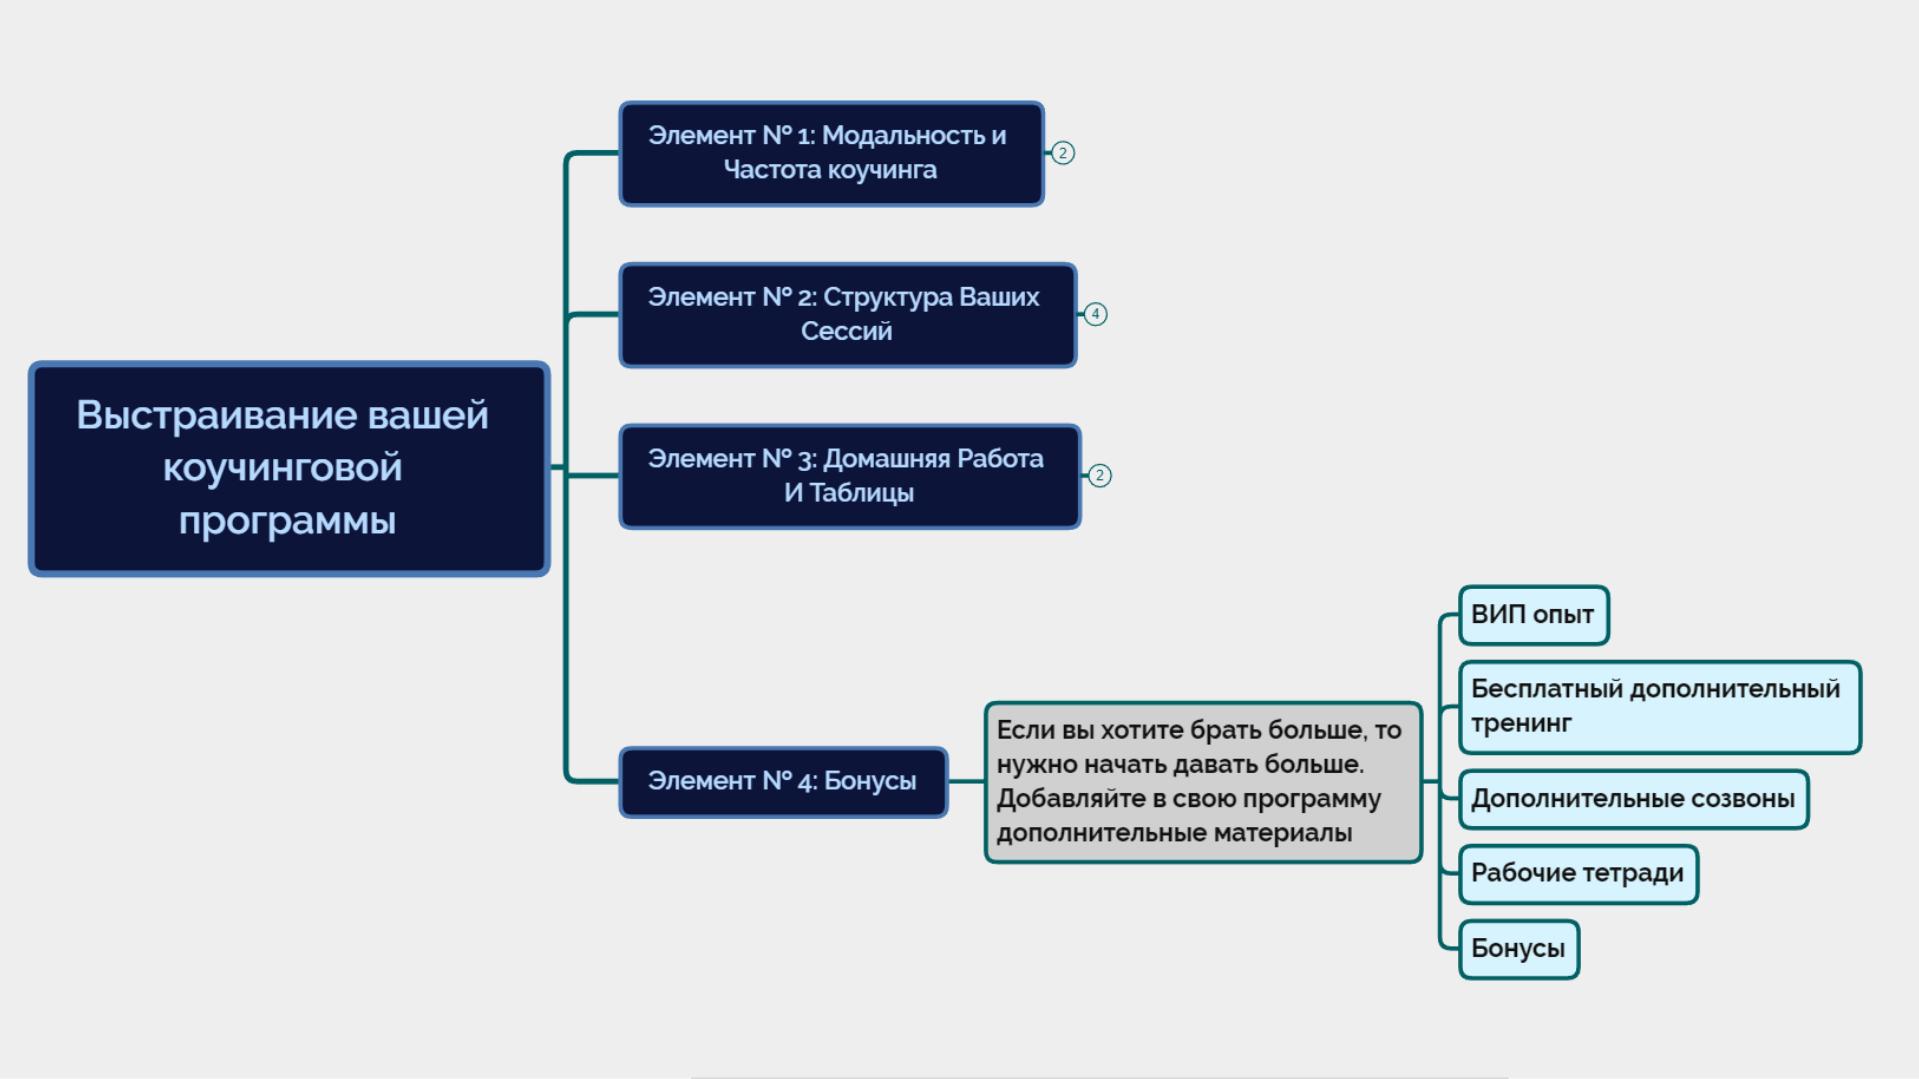 коучинговая программа алгоритм